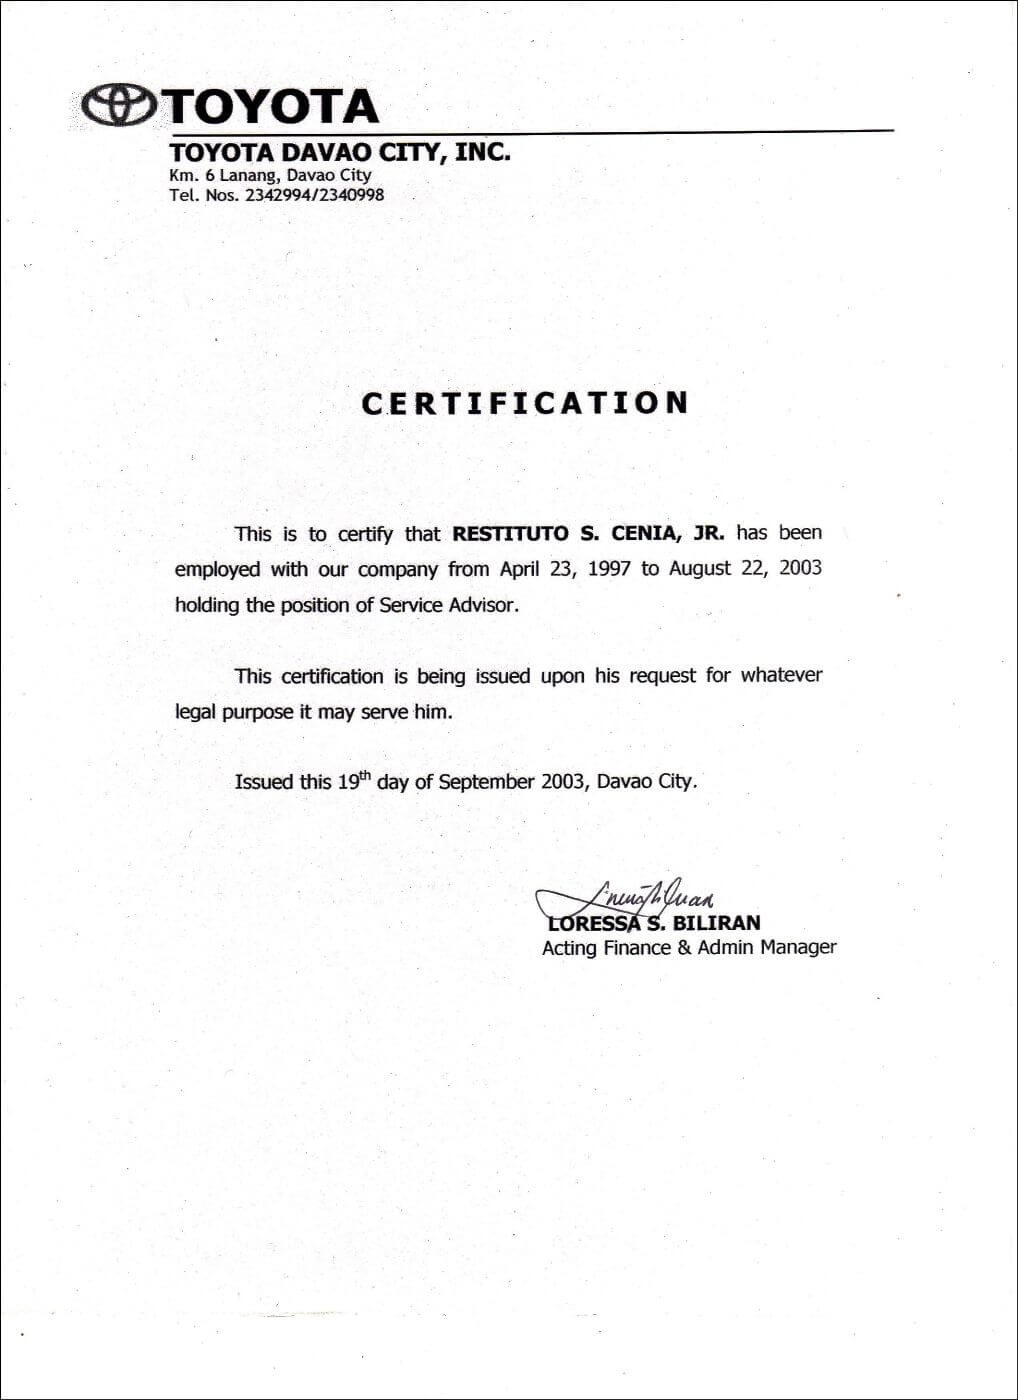 Employment Certificate Sample Best Templates Pinterest For Sales Certificate Template